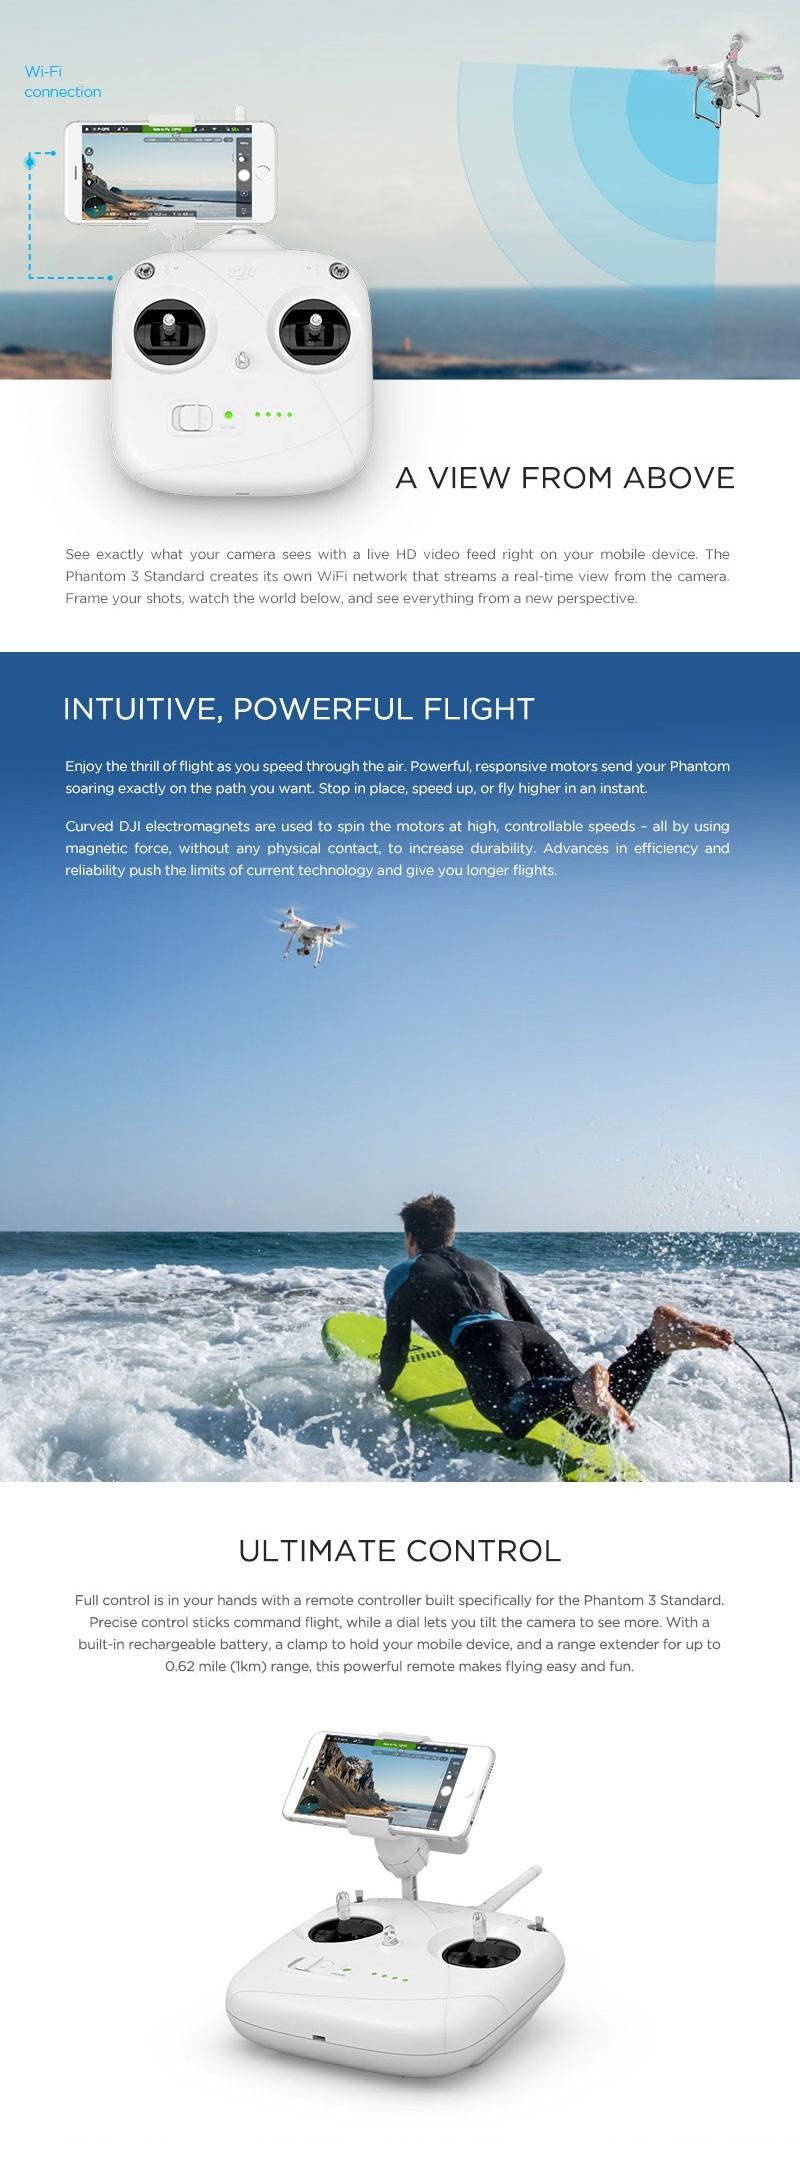 100% Original Dji Phantom 3 Standard Version Quadcopter Drone 3 Axis Gimbal  Drones With Hd Camera Fpv Rc Professional Helicopter - Buy Dji Phantom 3